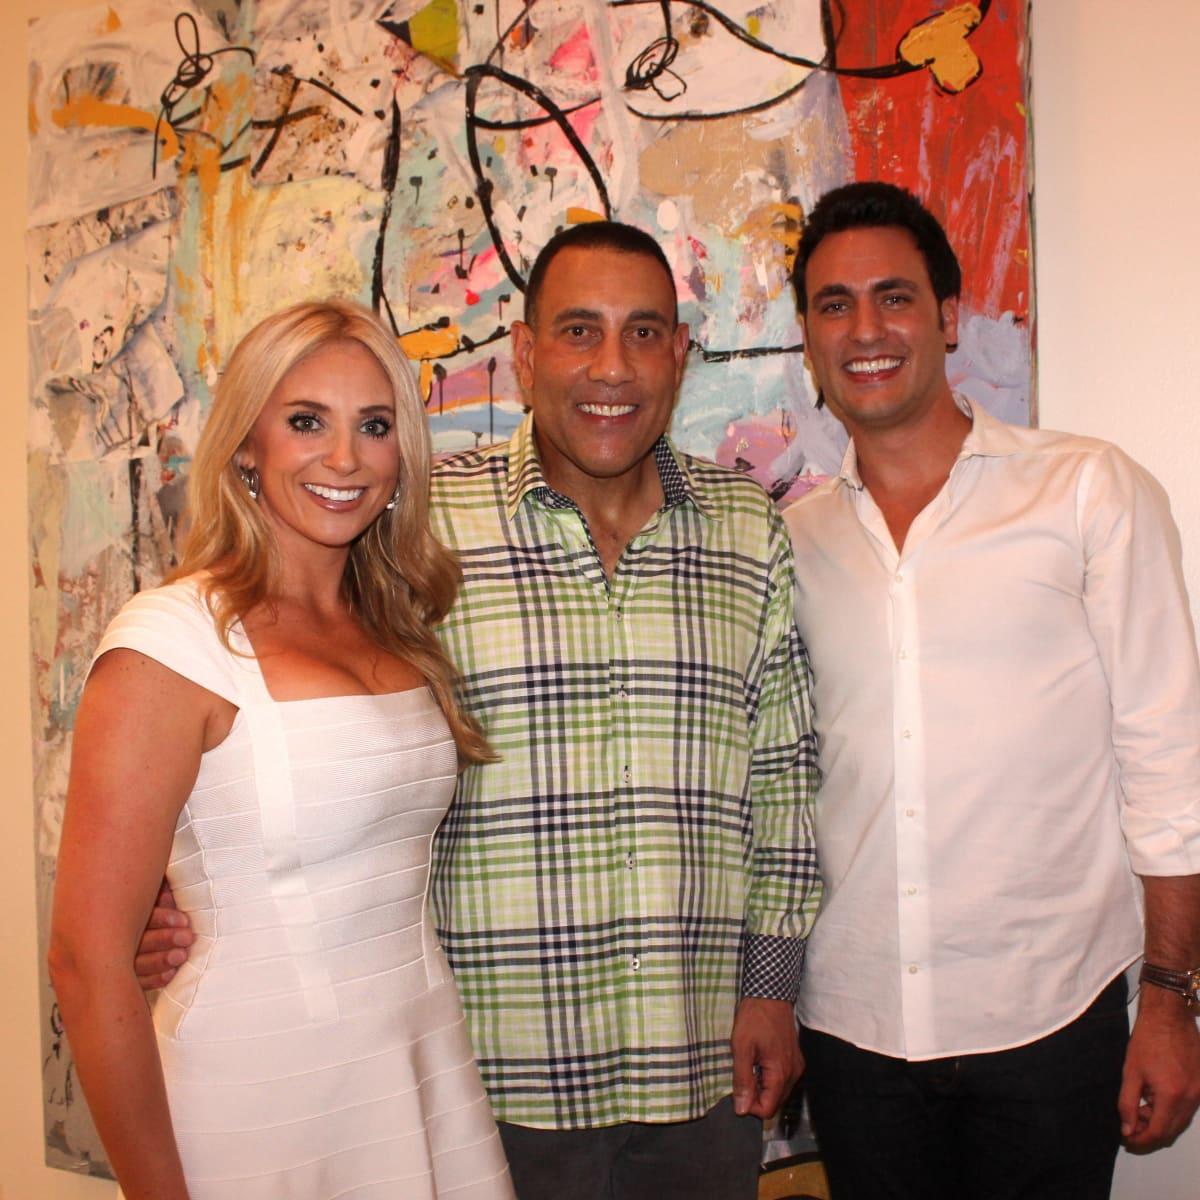 Houston, Chita Johnson engagement party, July 2015, Chita Johnson, Butch Alsandor, Lane Craft